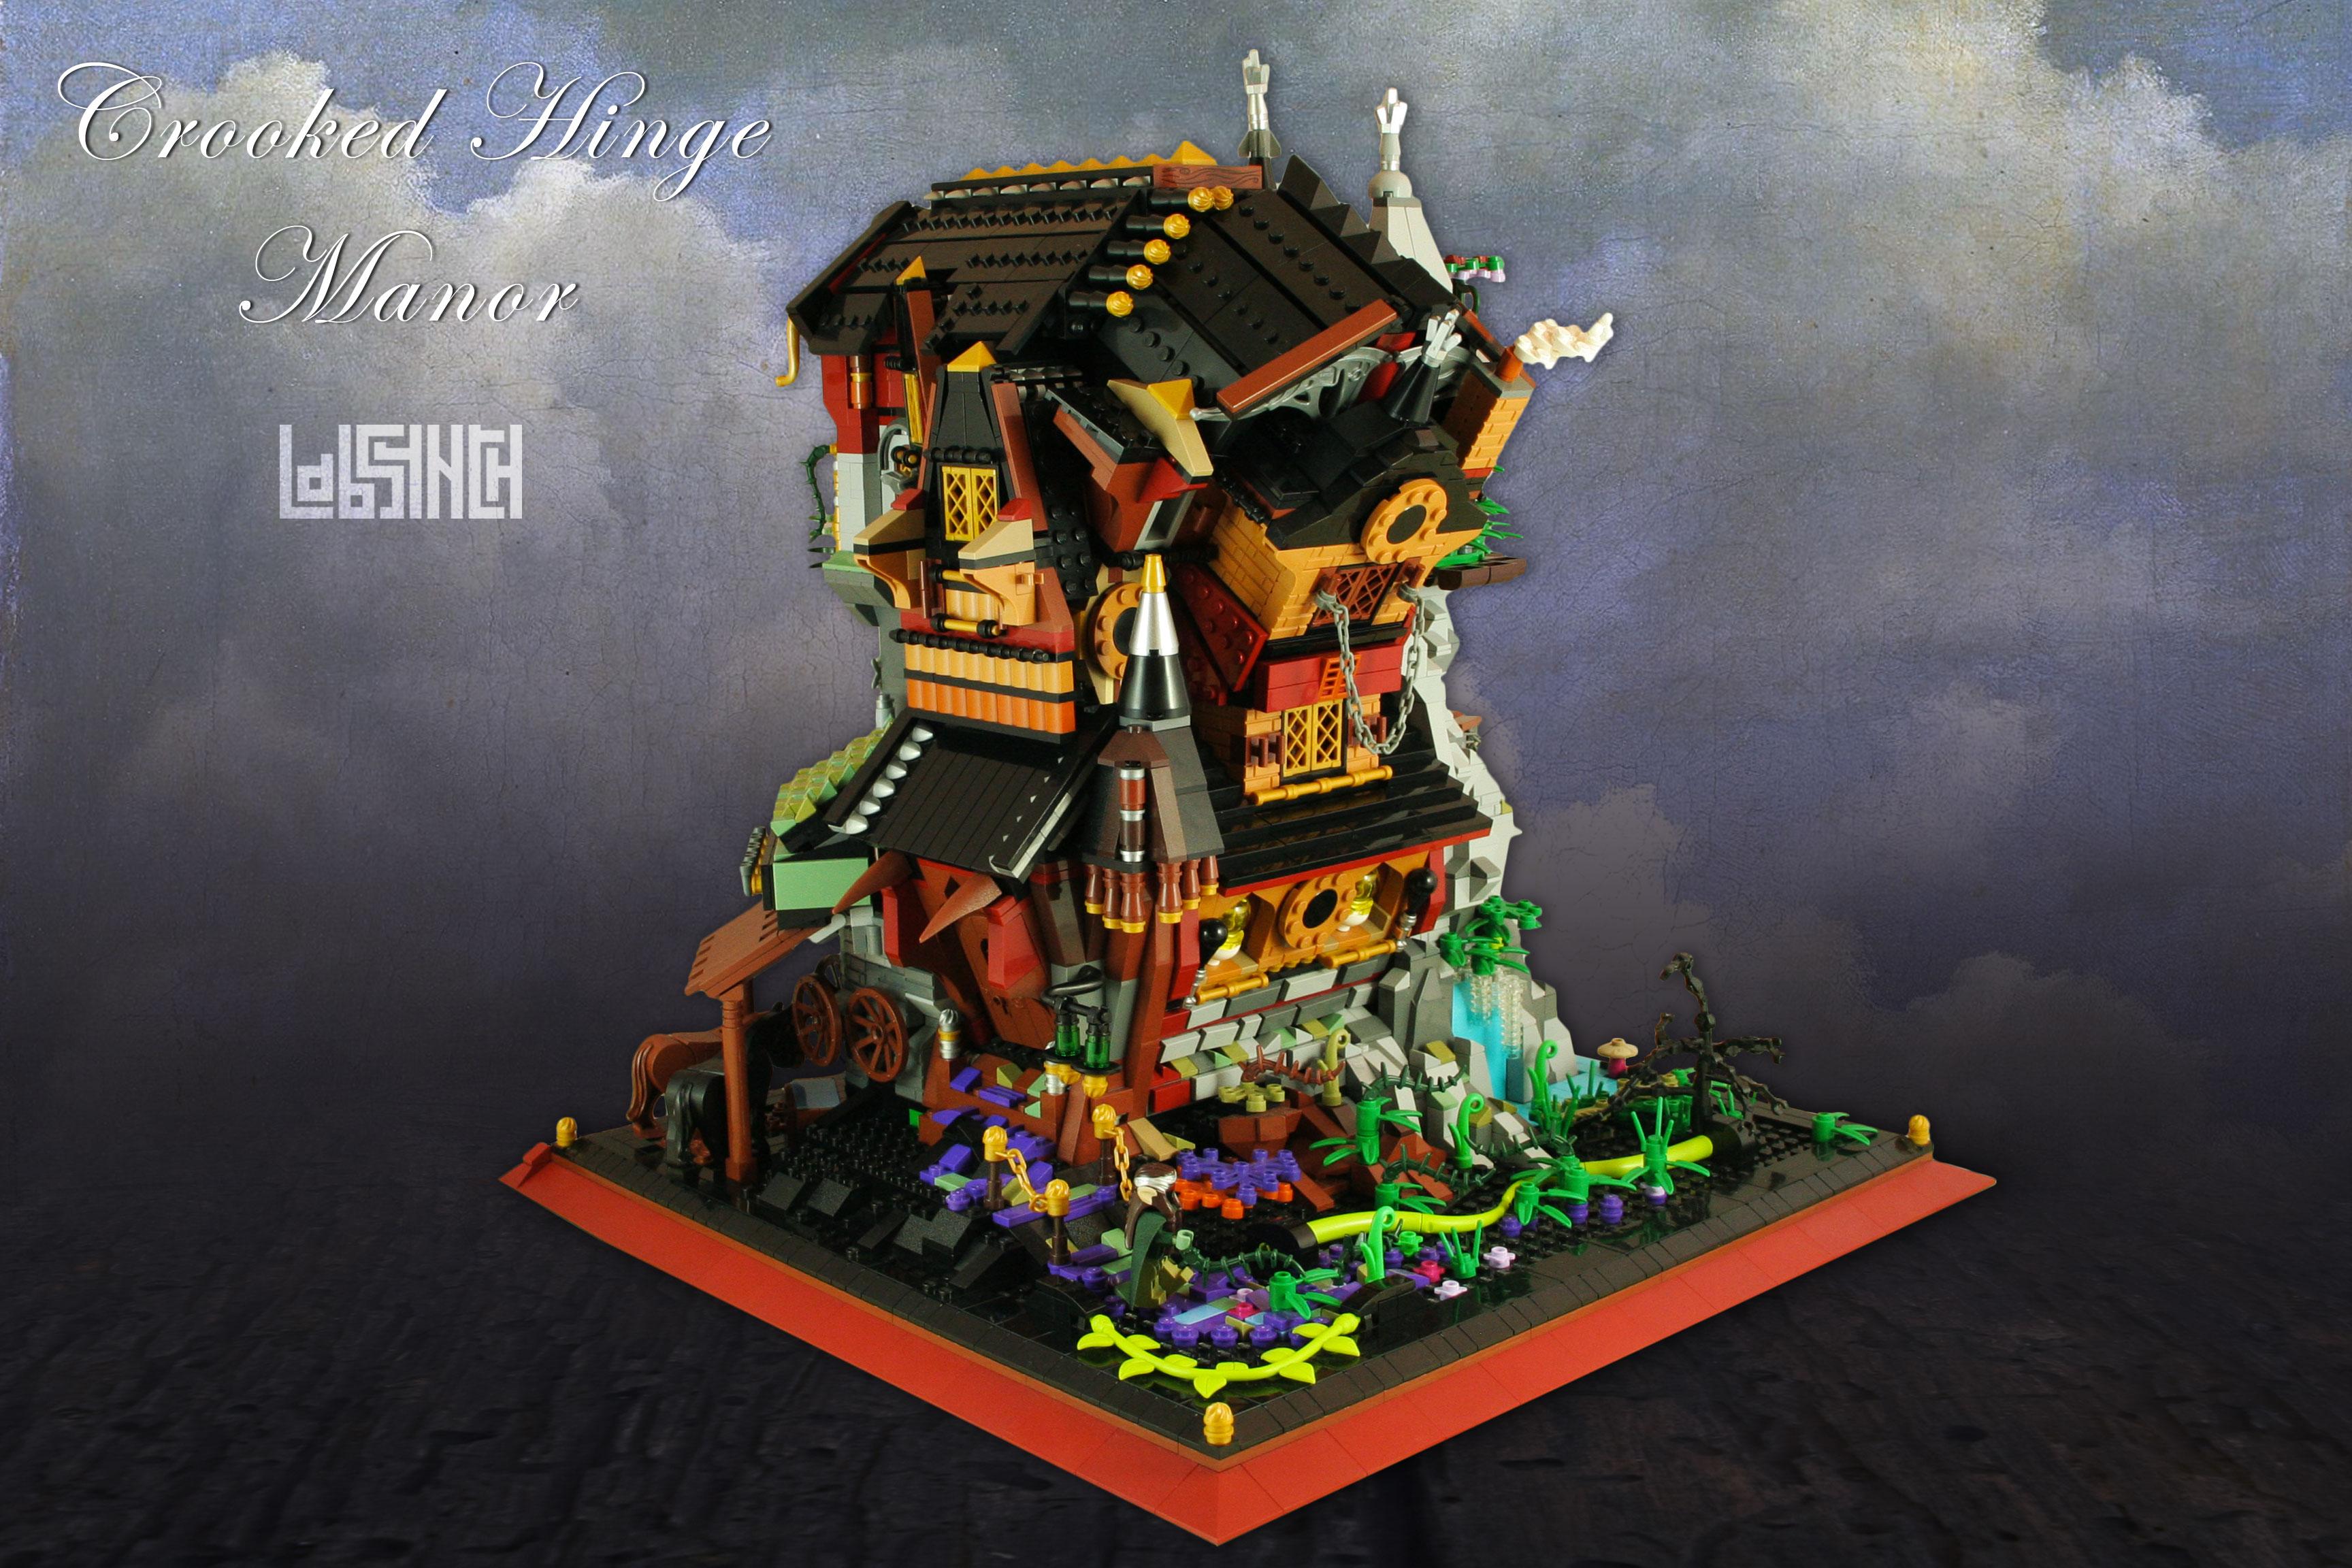 LEGO-MOC-CrookedHingeManor-sk2-01